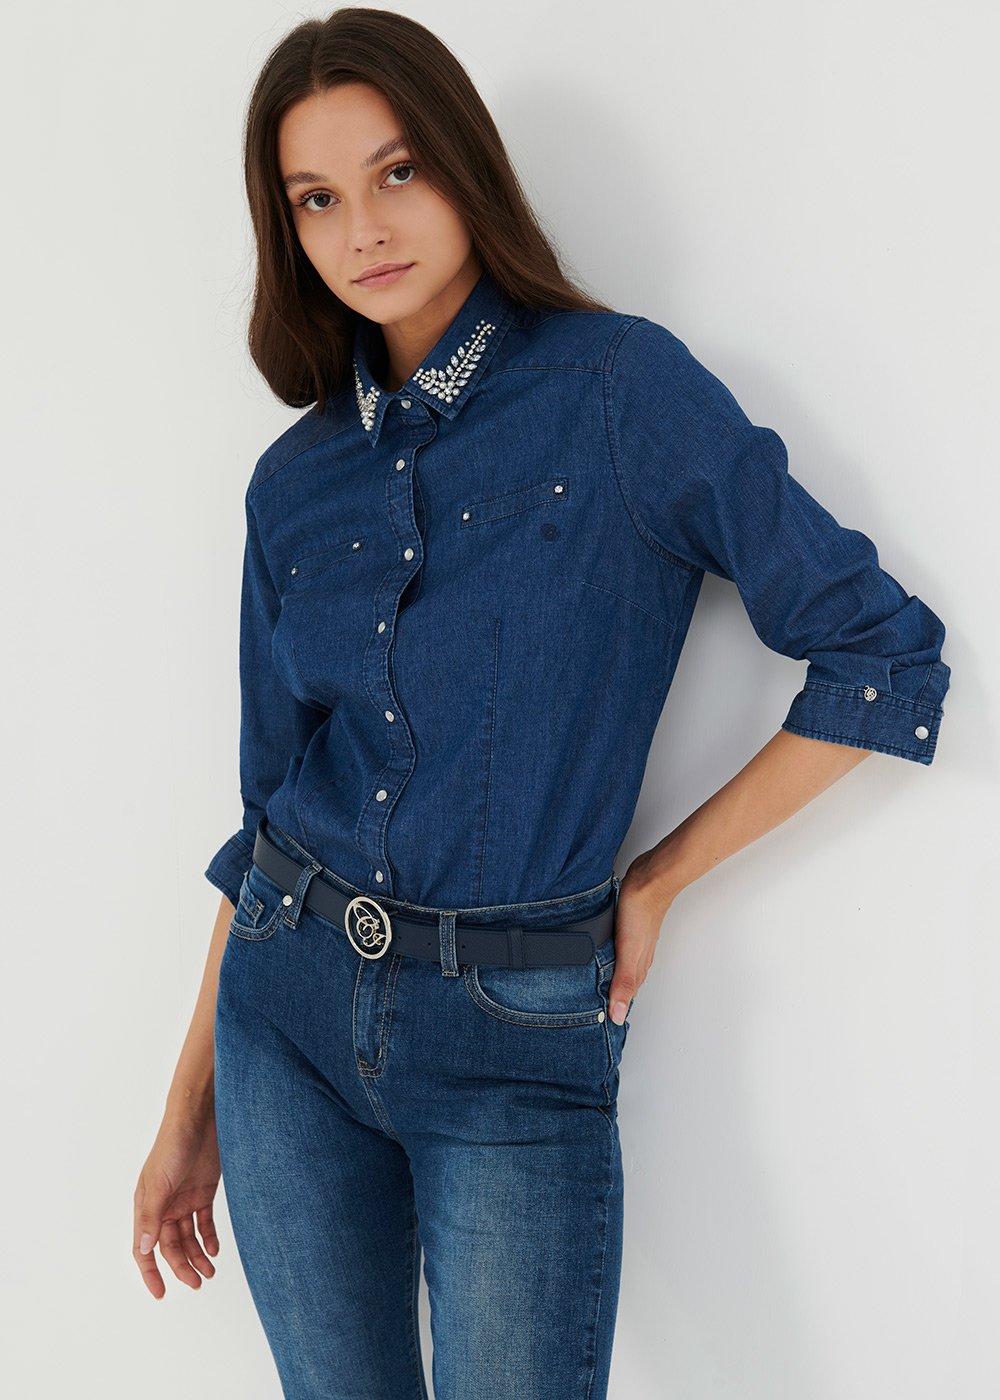 Denim shirt with rhinestones on the collar - Denim - Woman